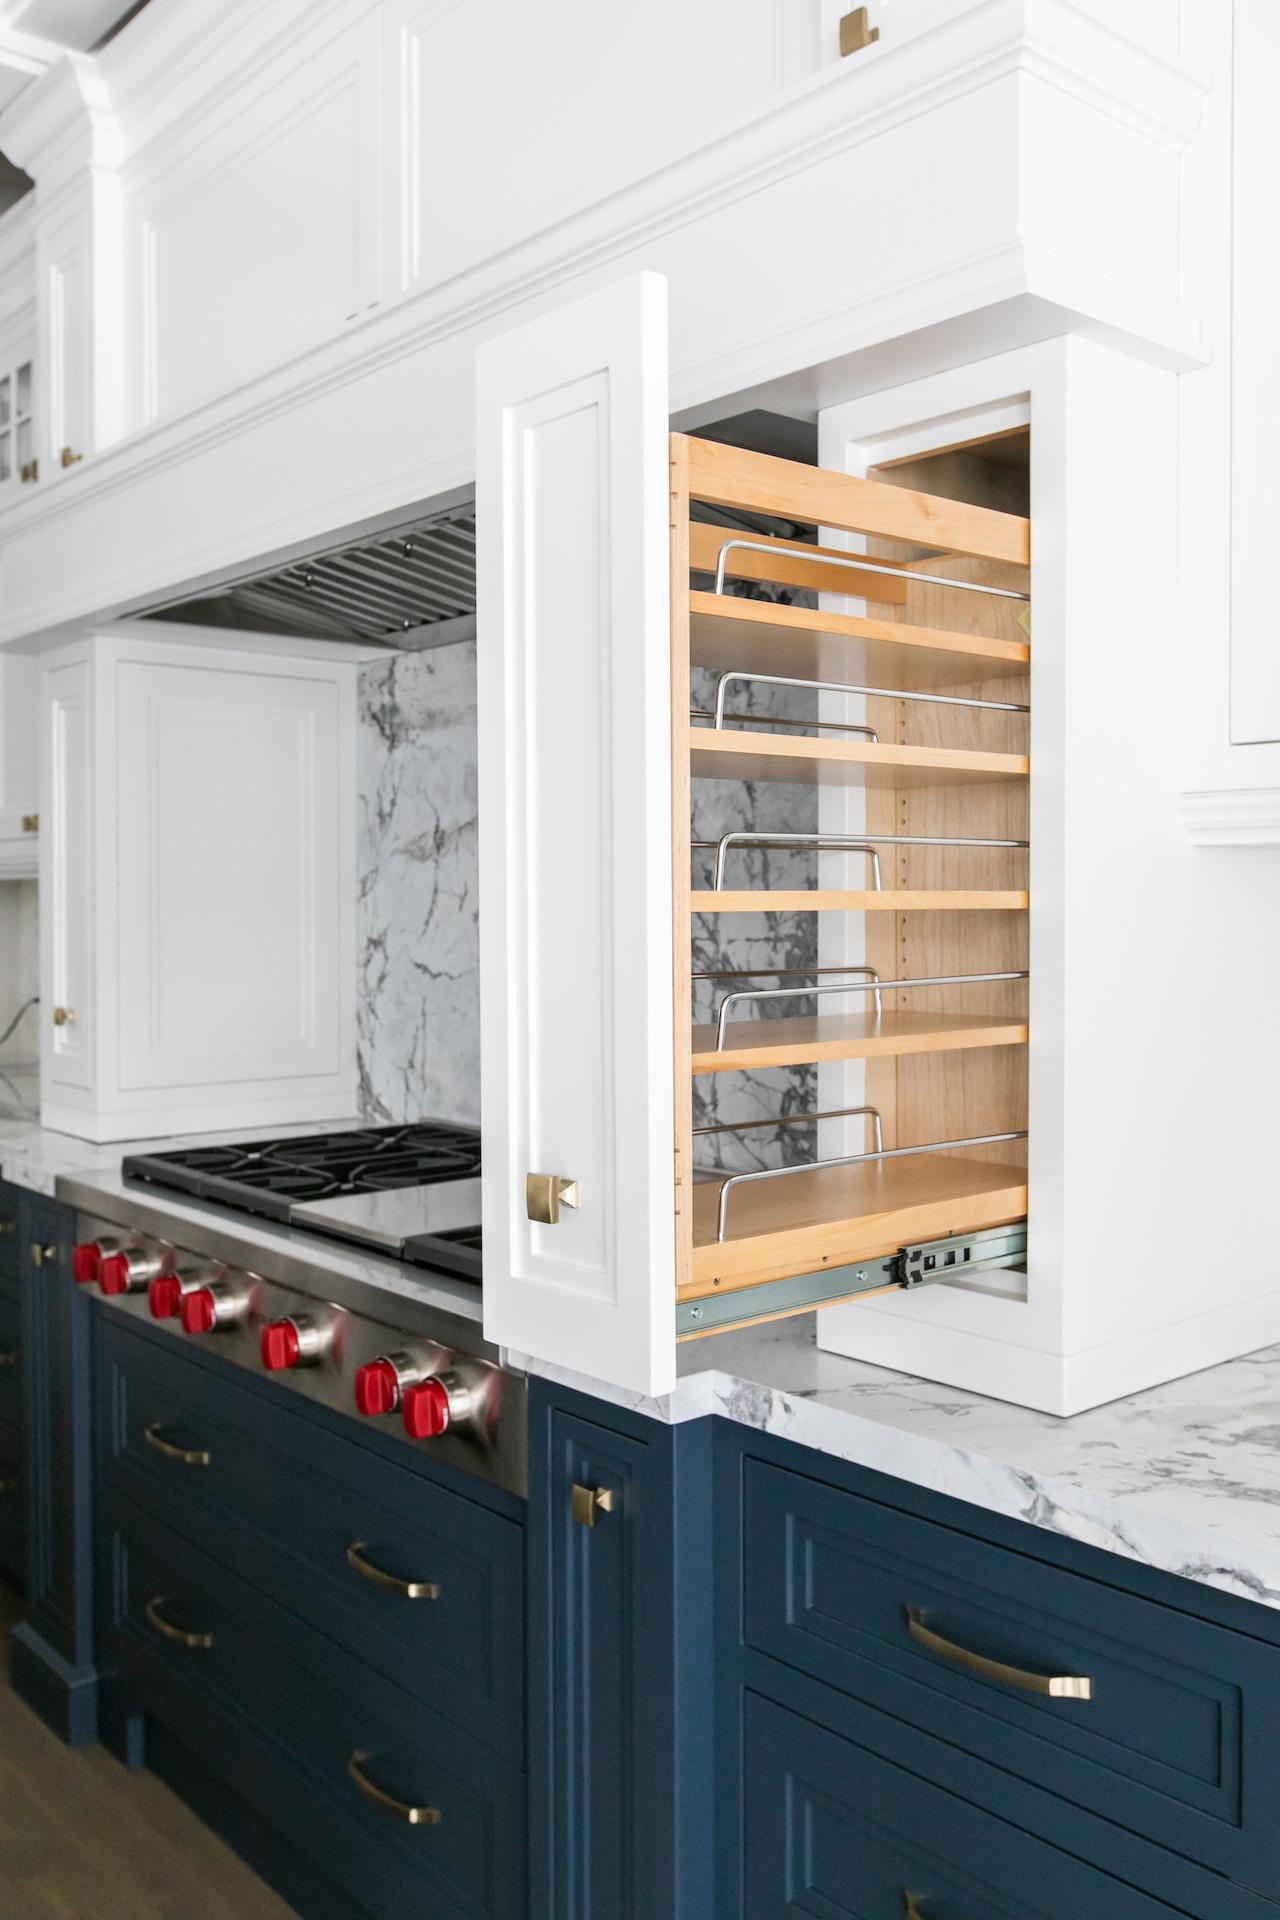 NIICO kicken cabinets